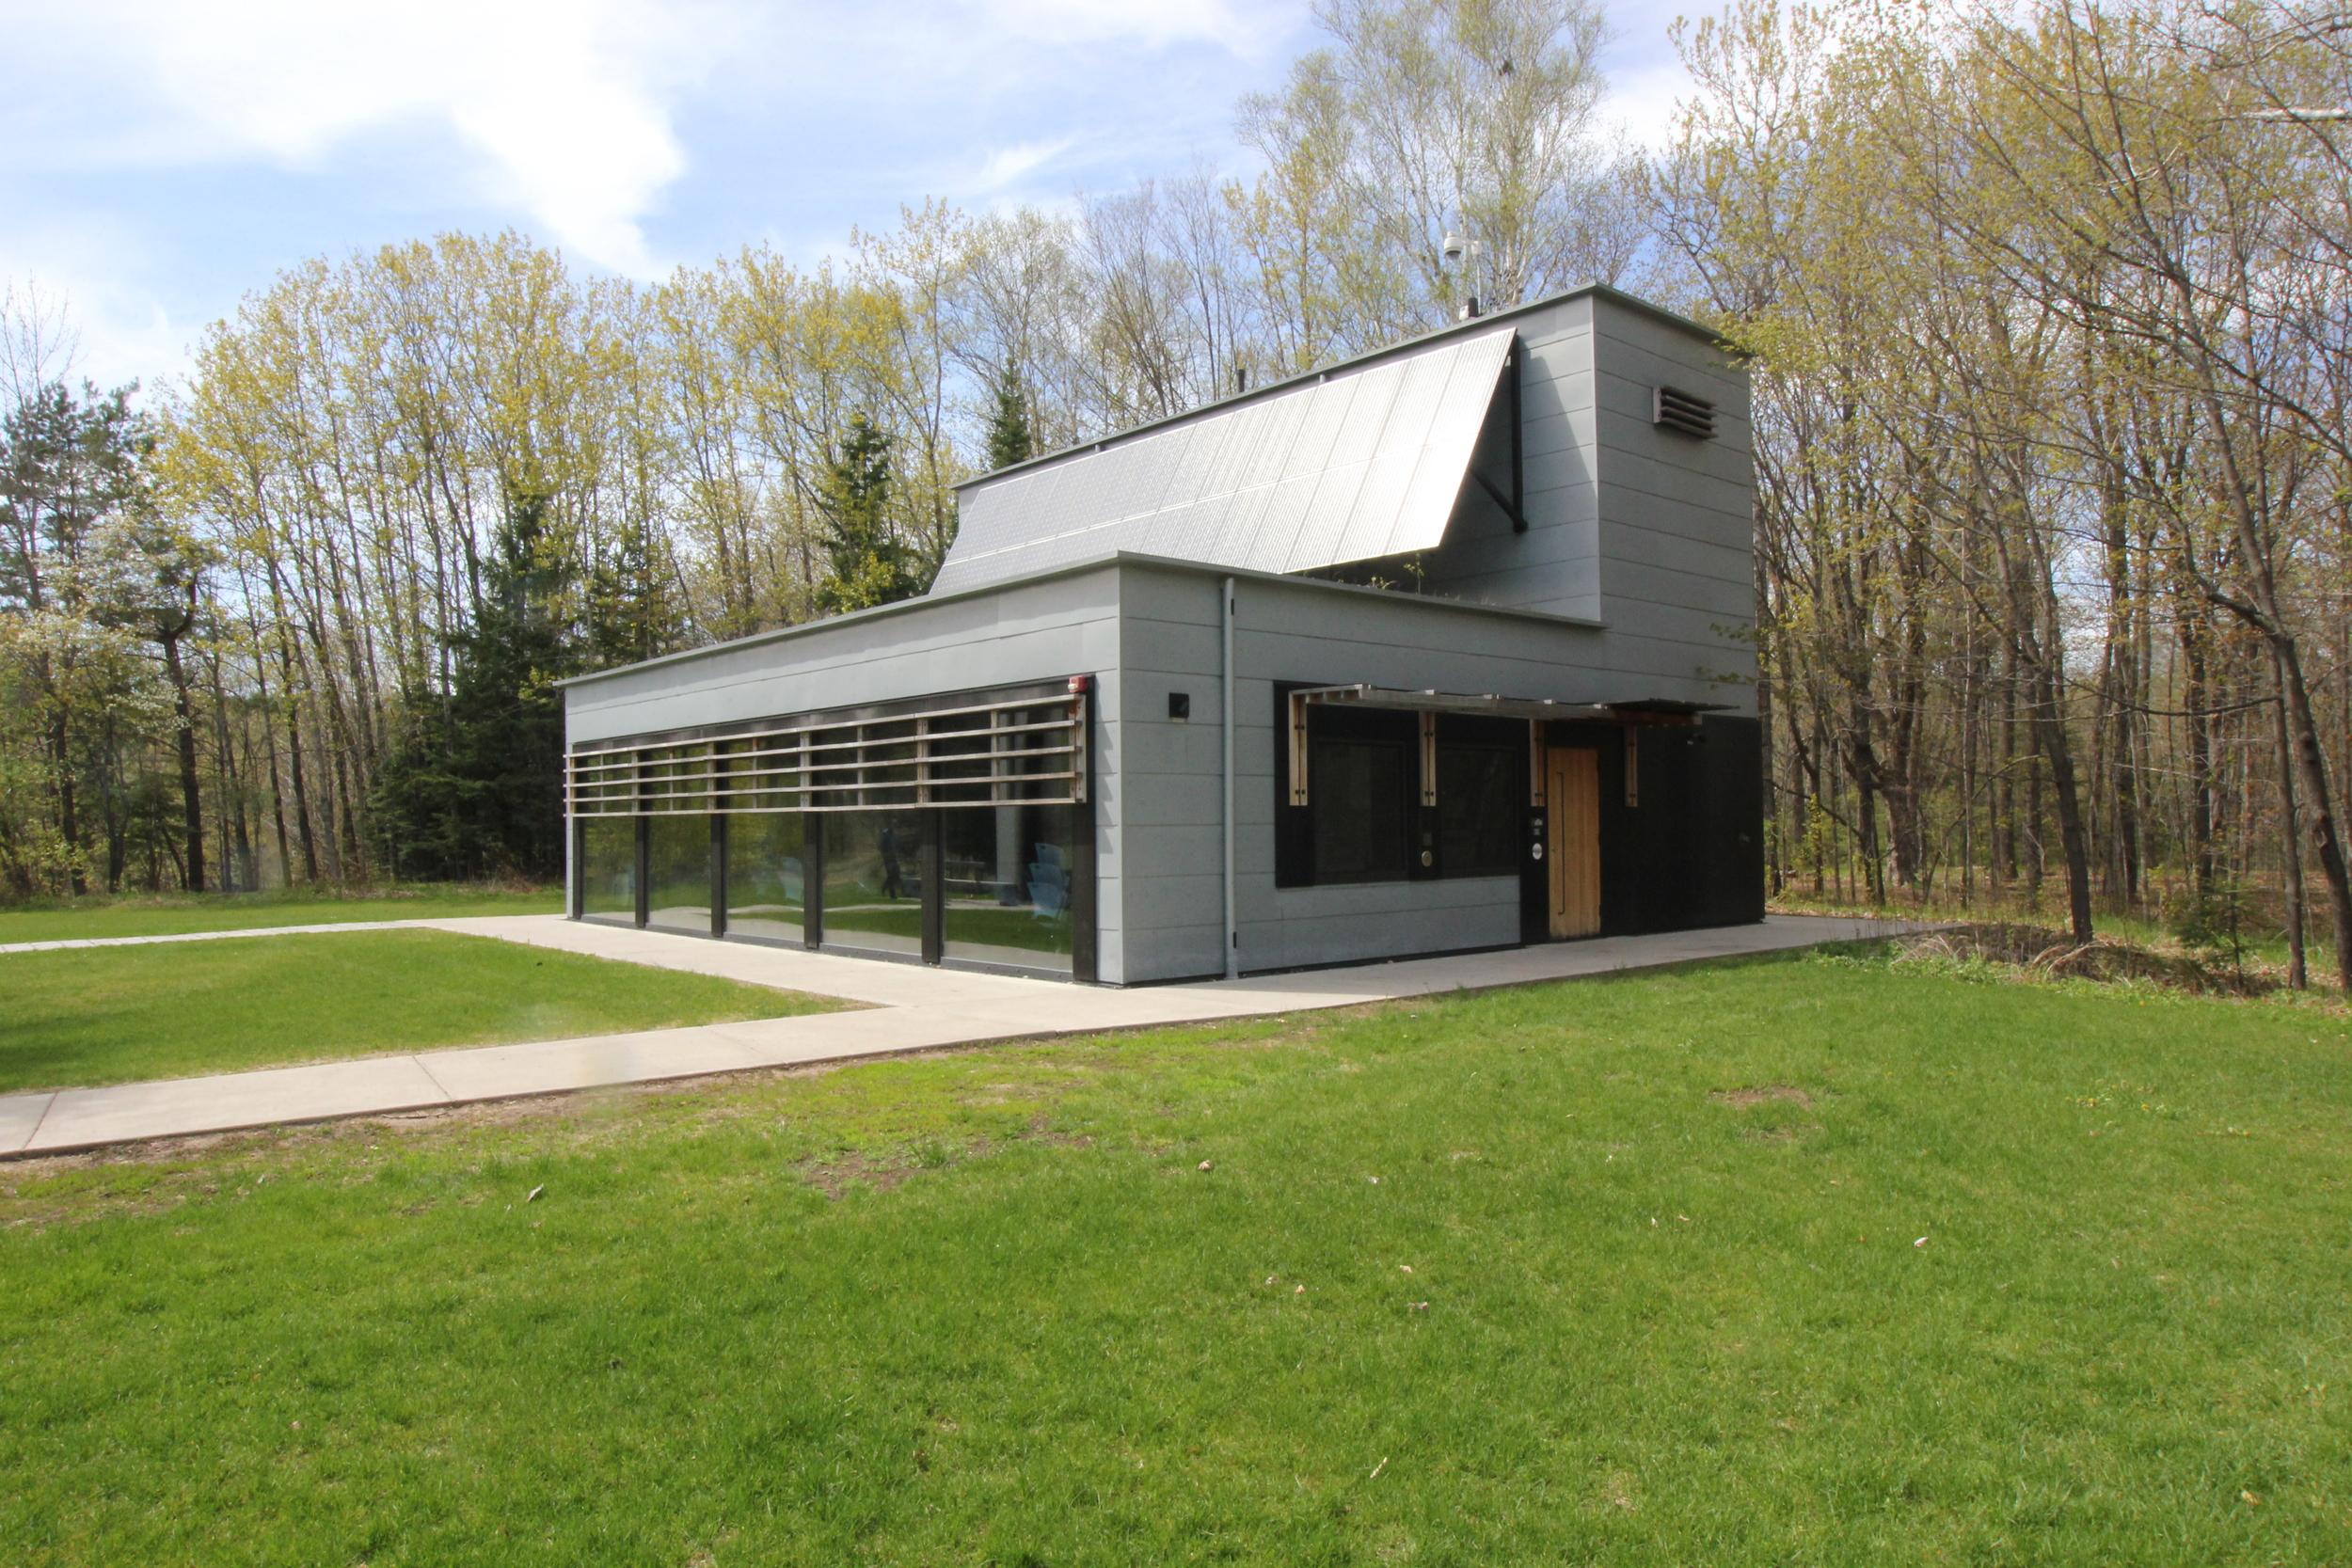 Bagley Nature Center